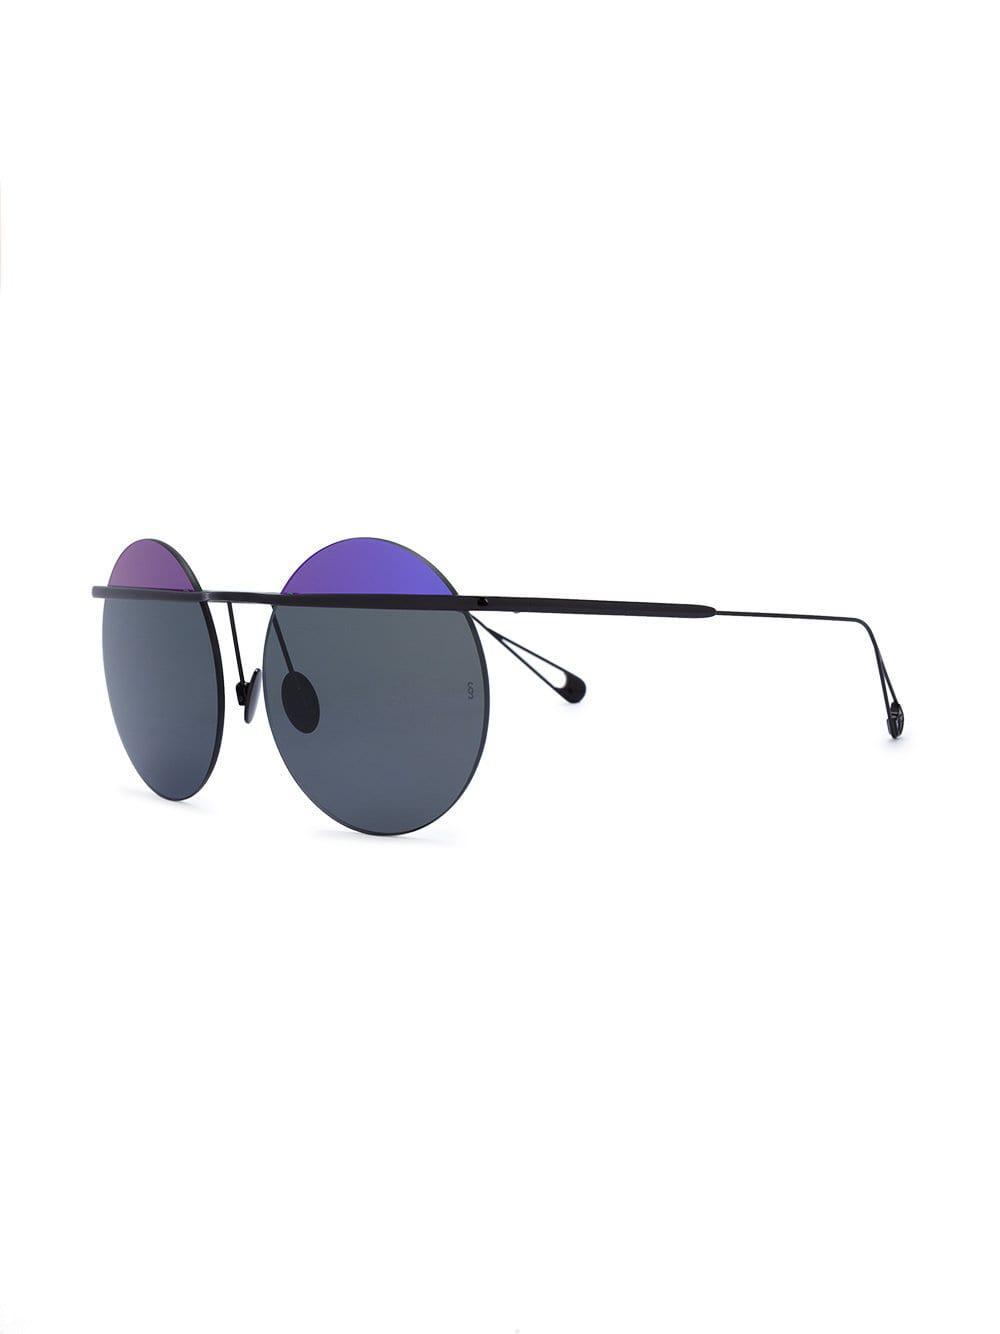 6852449c7a956 Sunday Somewhere Black And Purple Two-tone Round Minggu Sunglasses in Purple  - Lyst